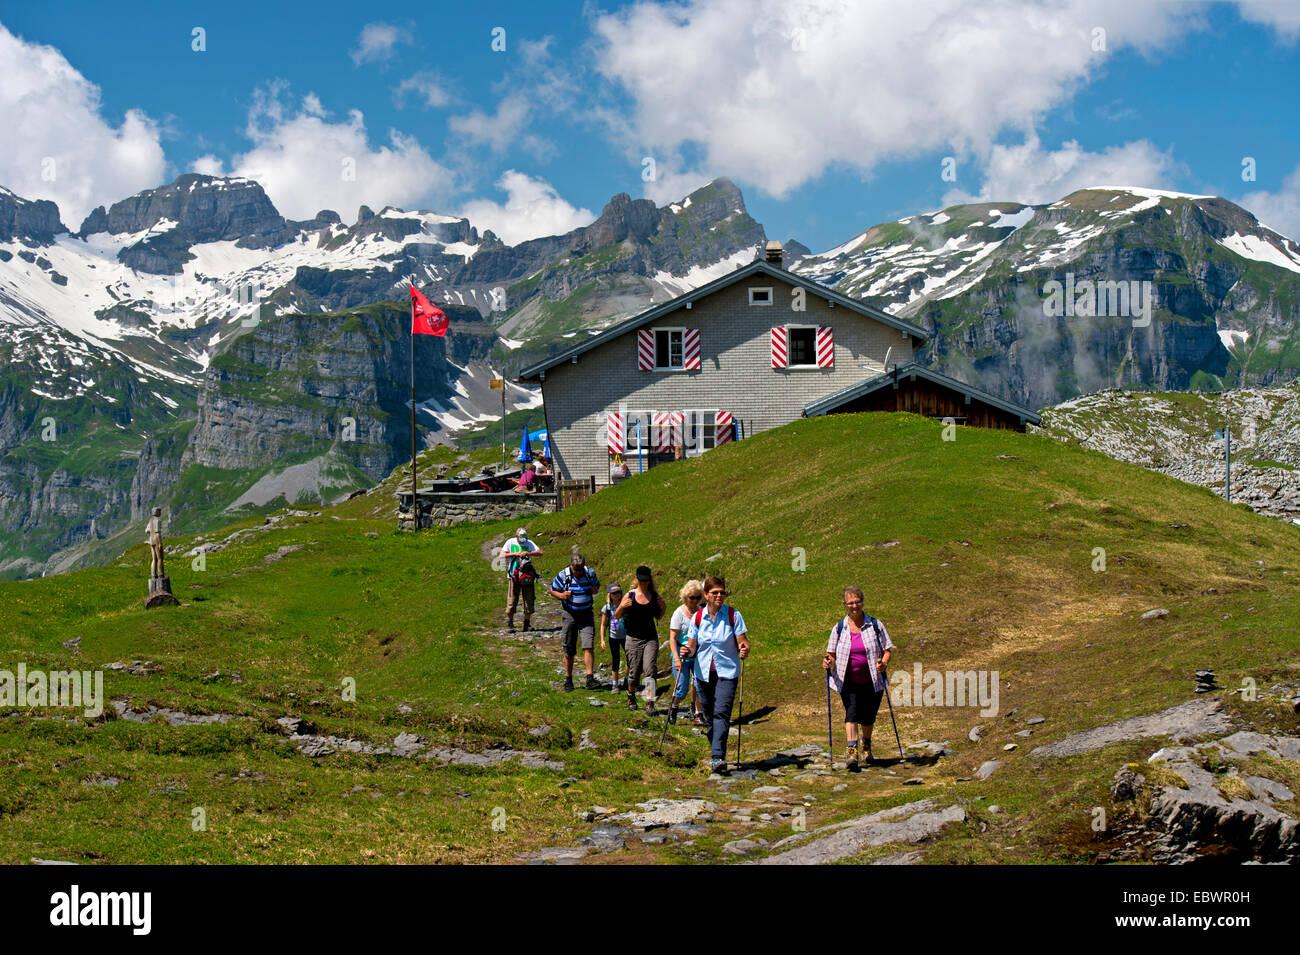 Hikers at the Glattalp Hut, Glarus Alps, Western Alps, Canton of Schwyz, Switzerland - Stock Image